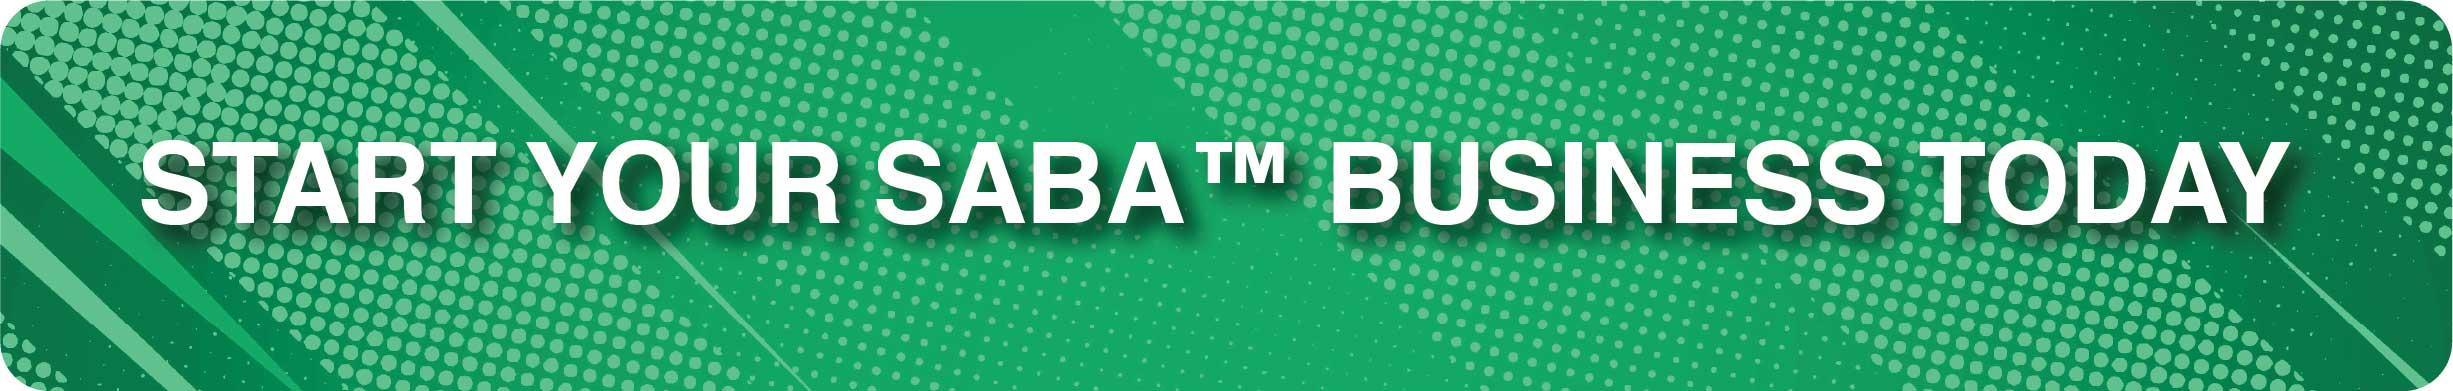 Start Saba Business Today